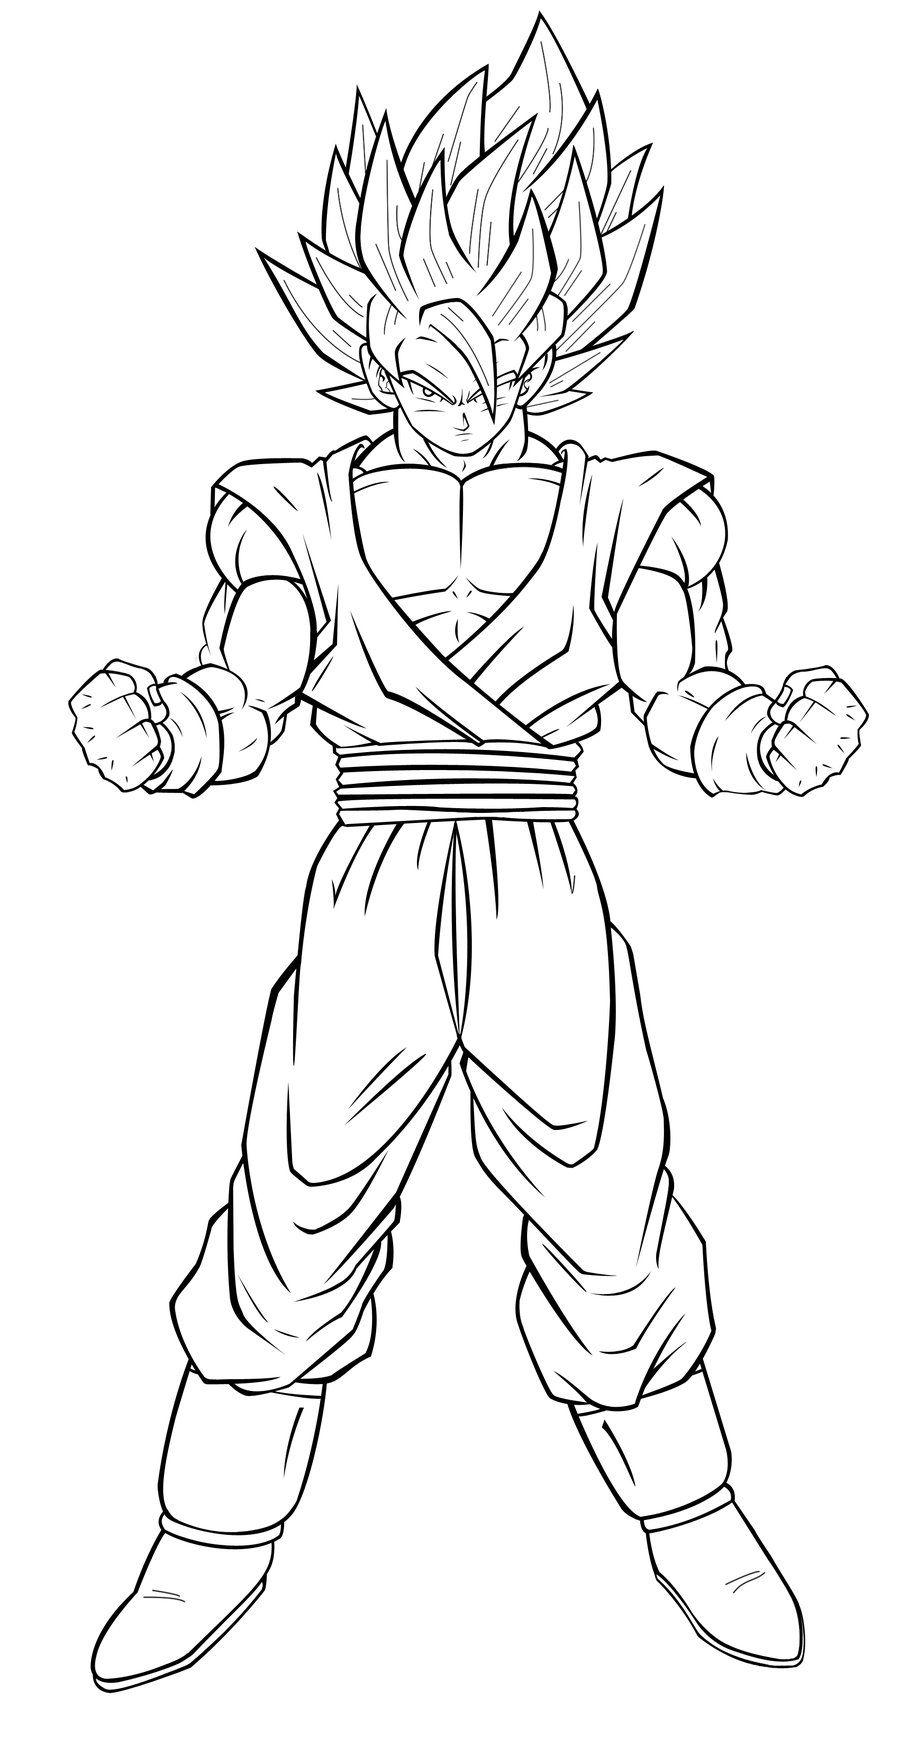 900x1737 Goku Super Saiyan Coloring Pages Images Isaiah Birthday